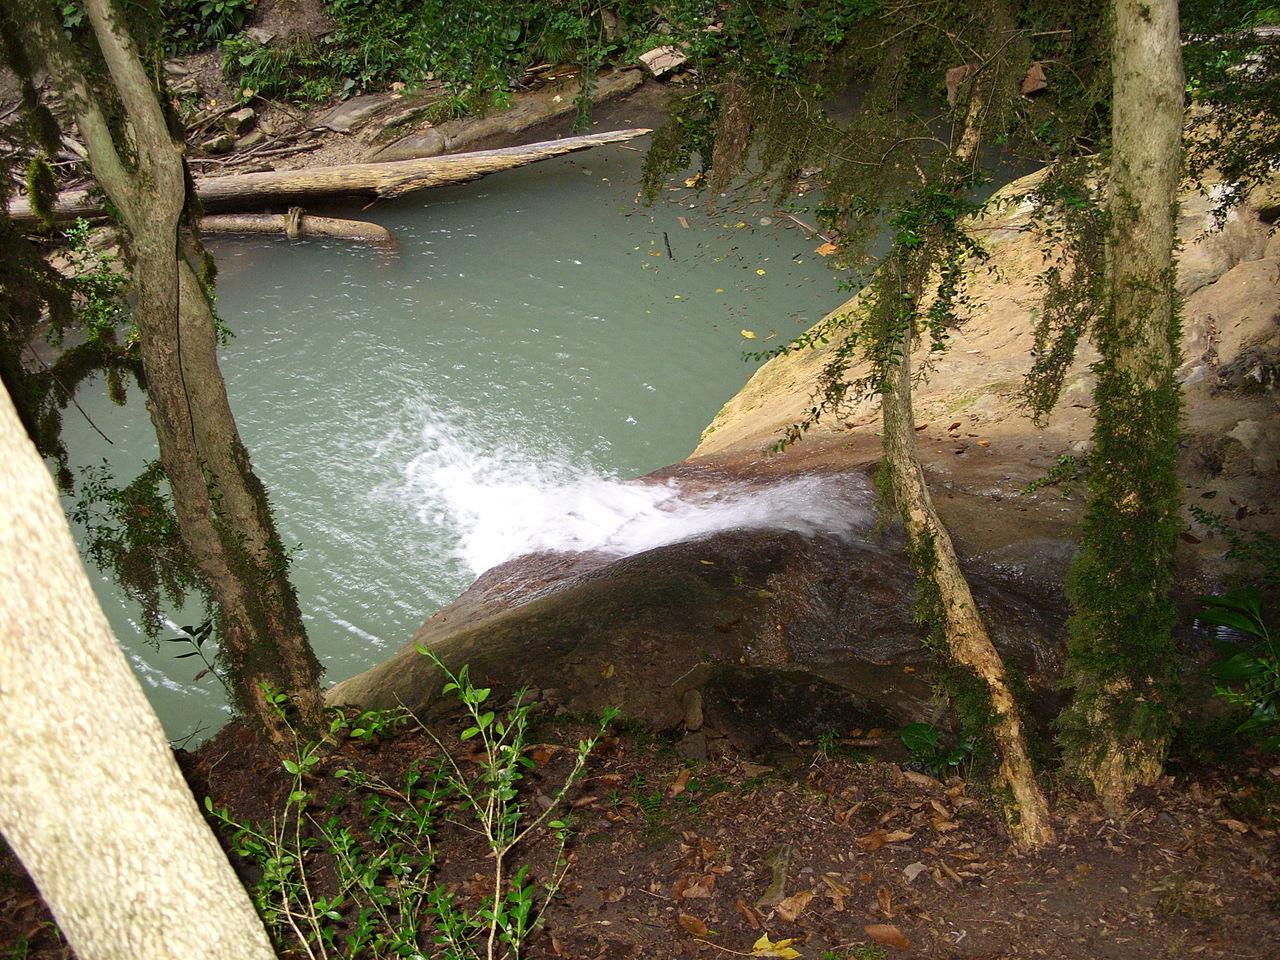 Каскад Тридцать три водопада, Сочи